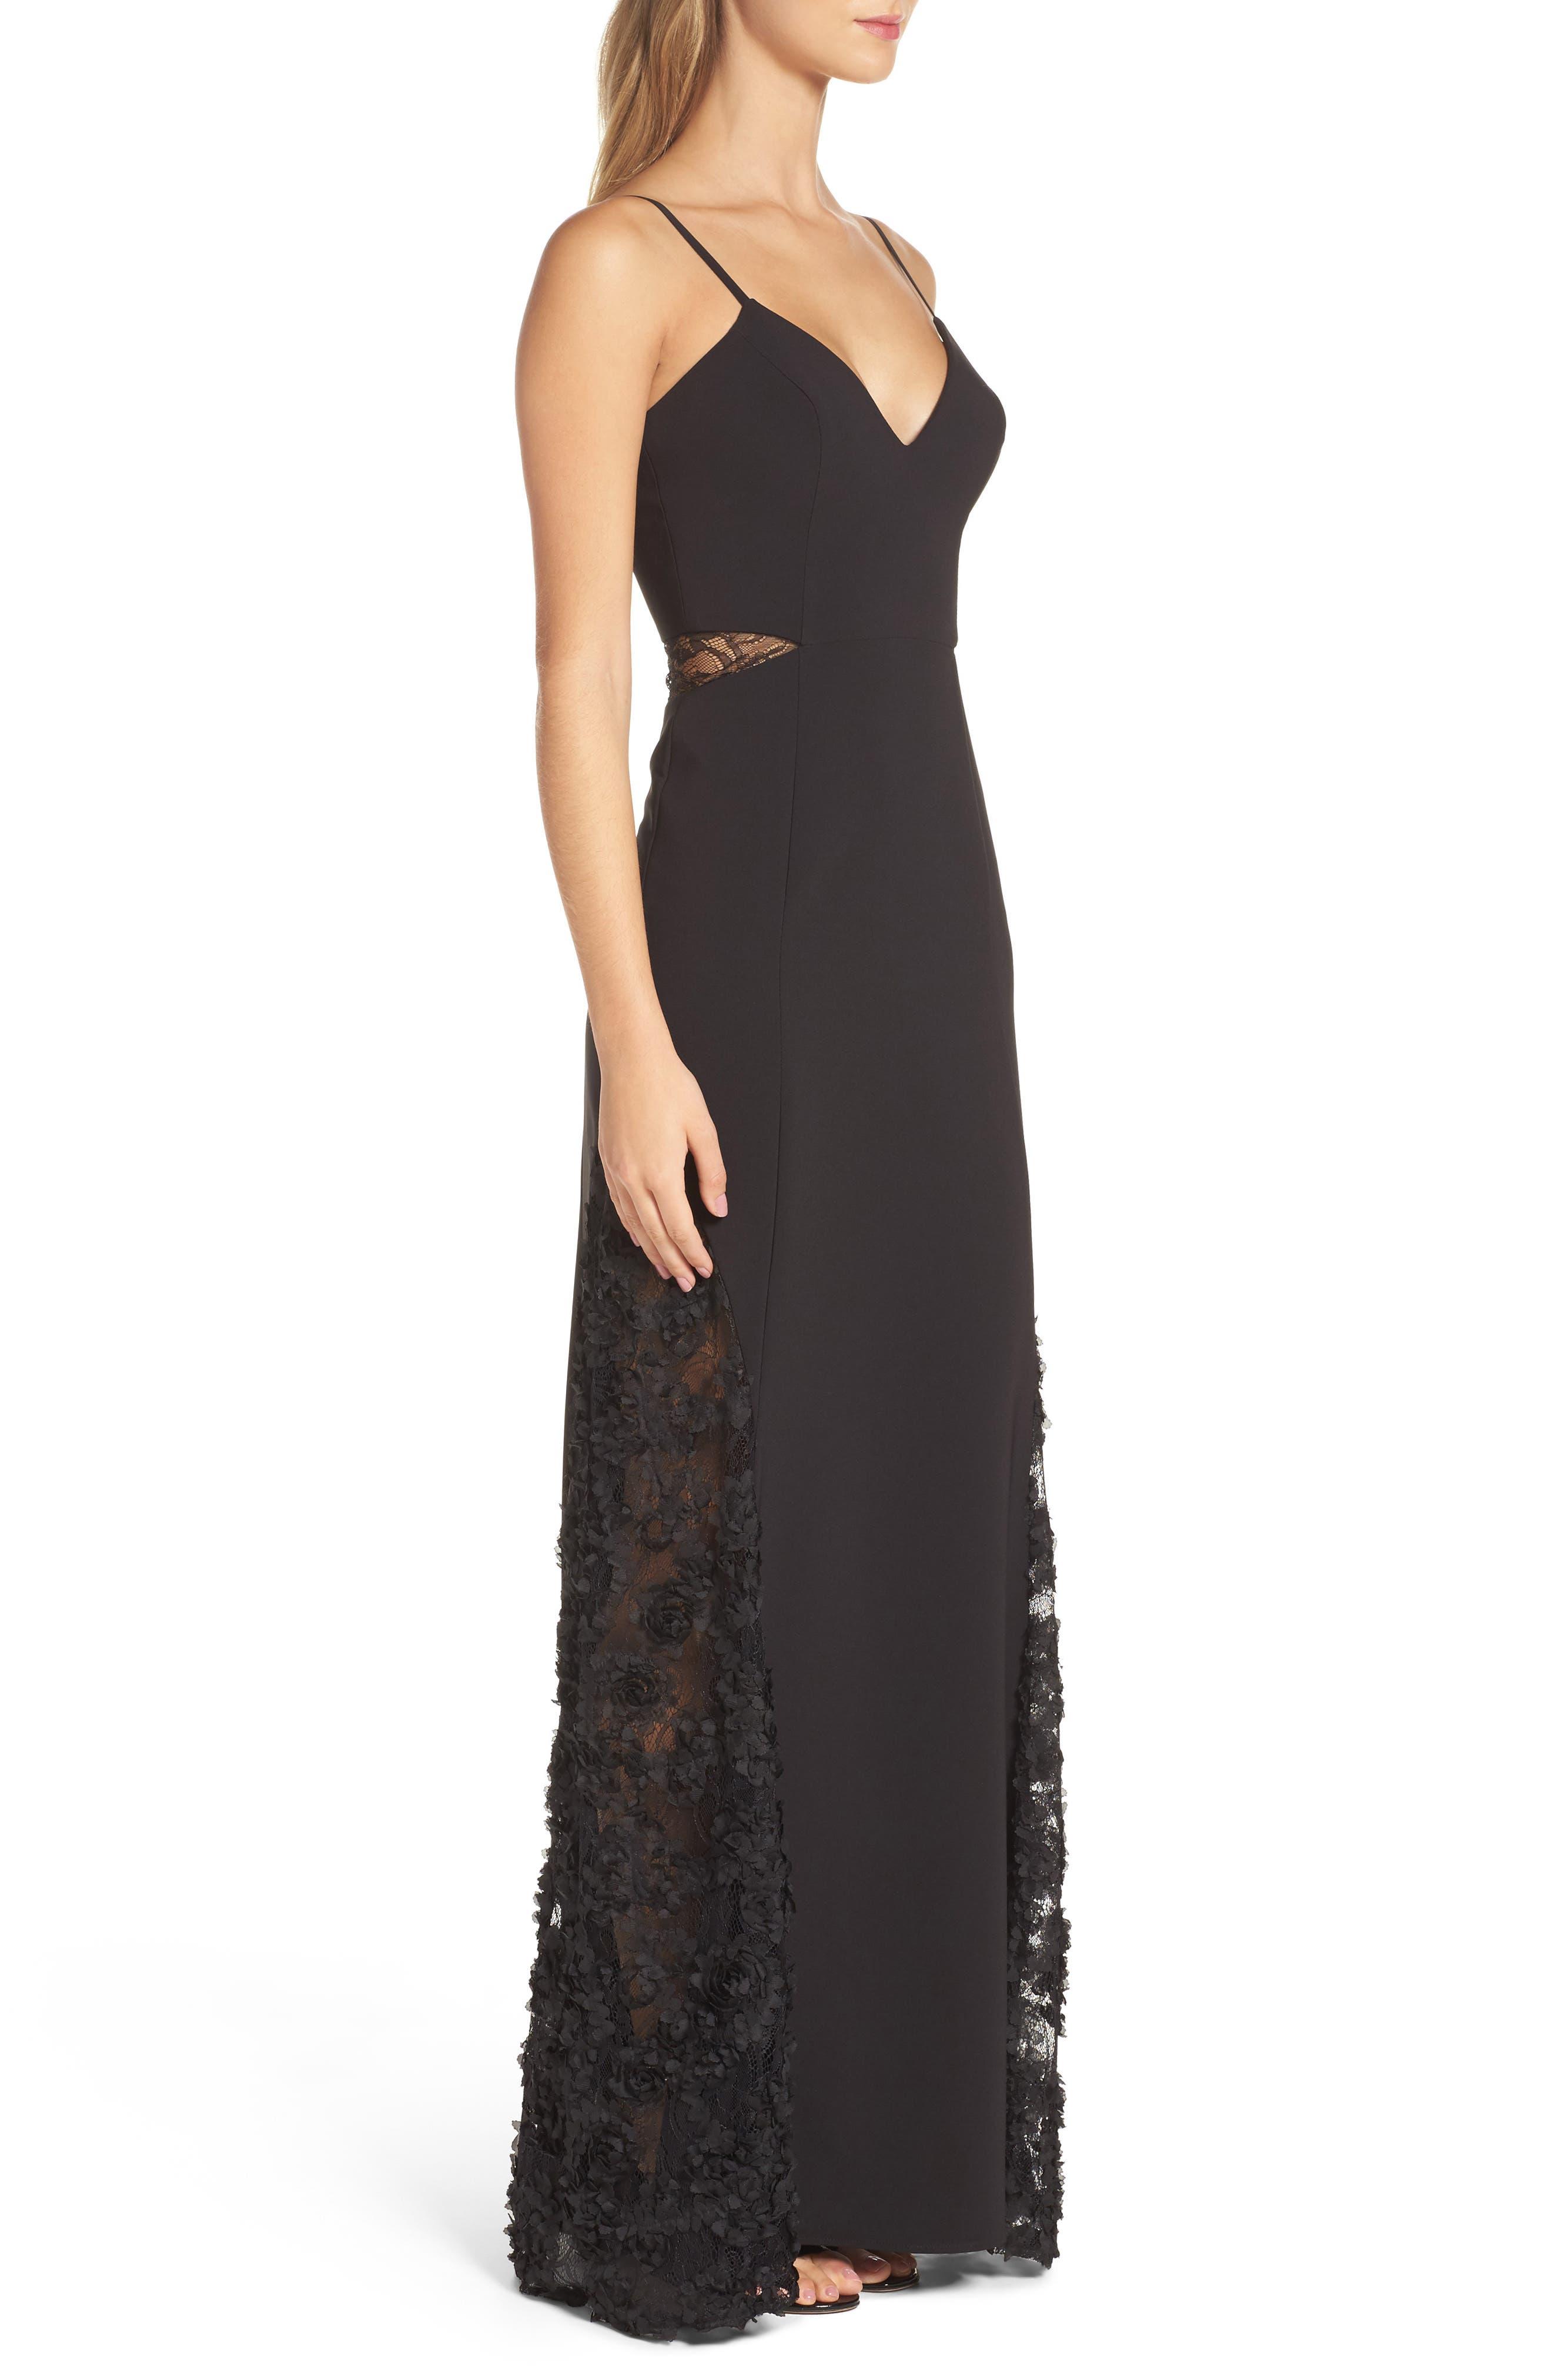 Shannon Lace Inset Gown,                             Alternate thumbnail 3, color,                             Black